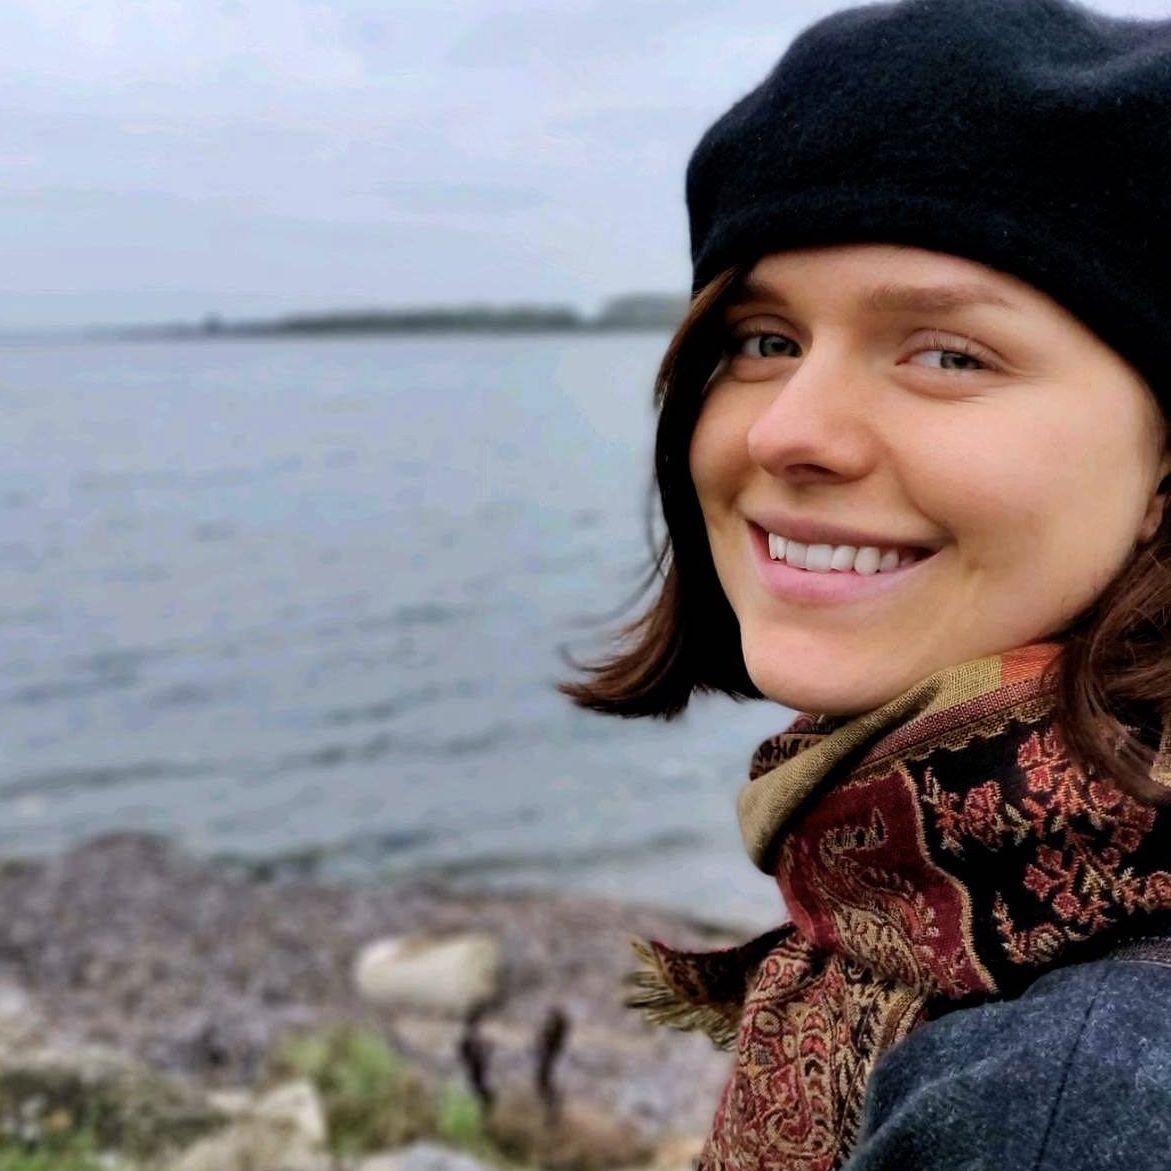 Isabella Mery-Ann